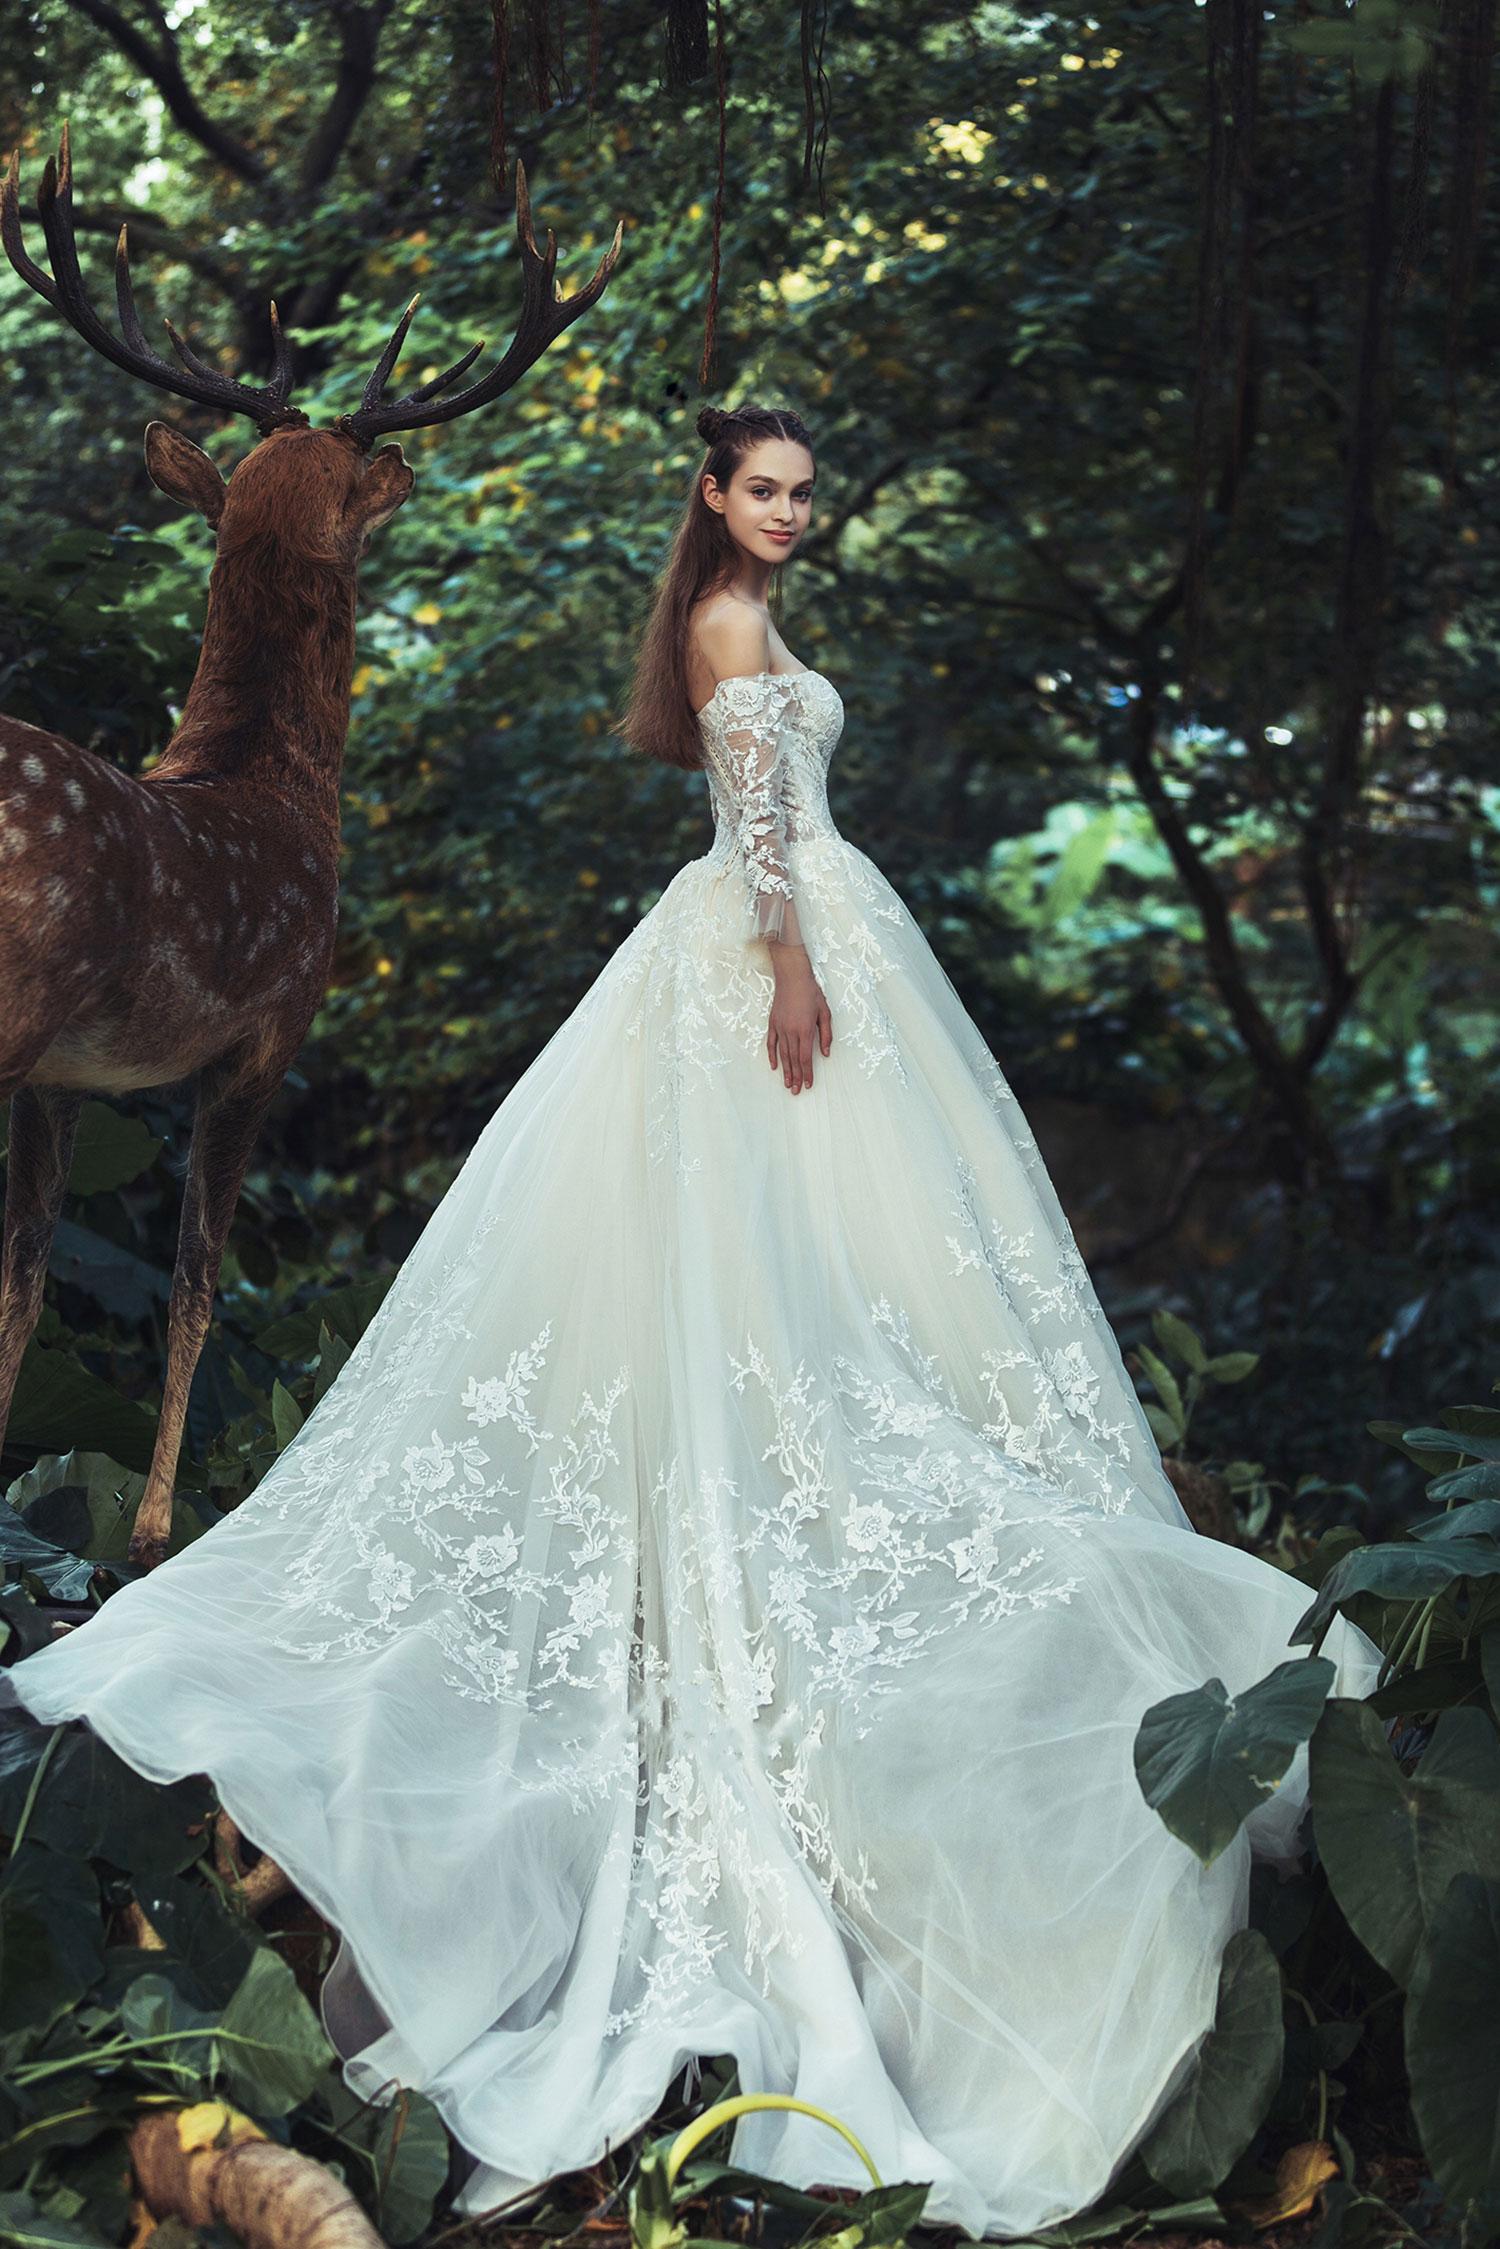 off-the-shoulder-sweetheart-lace-wedding-dress.jpg